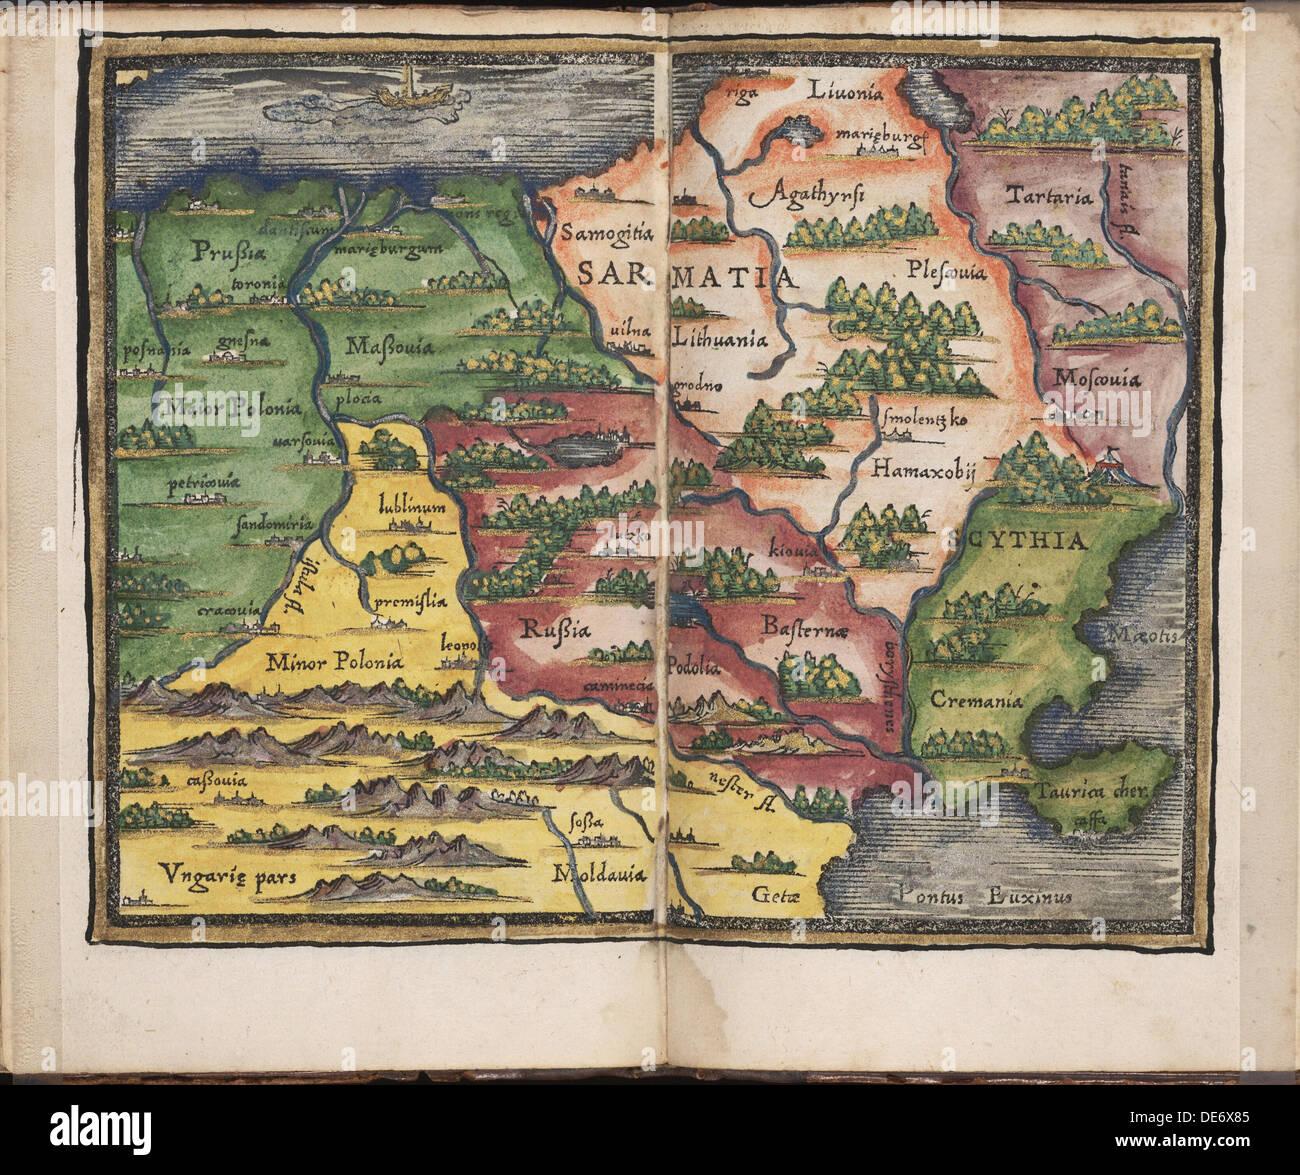 Map of Sarmatia (From: Rudimenta Cosmographica), 1542. Artist: Honterus (Honter), Johannes (1498-1549) - Stock Image